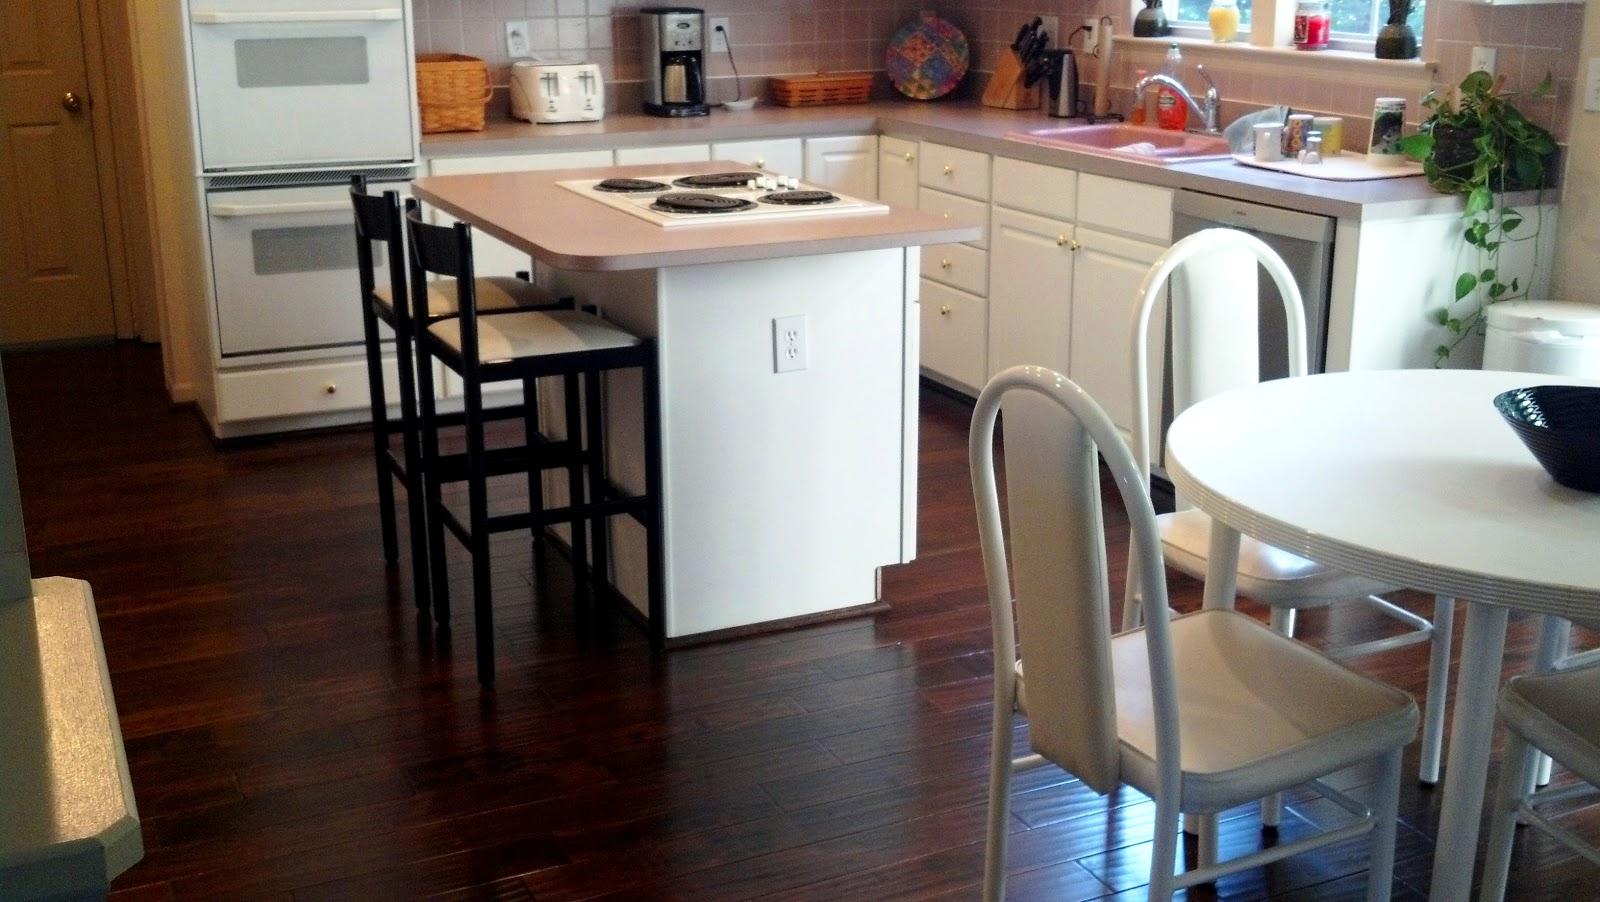 Let's Talk About Floors: [My Work] Hardwood+